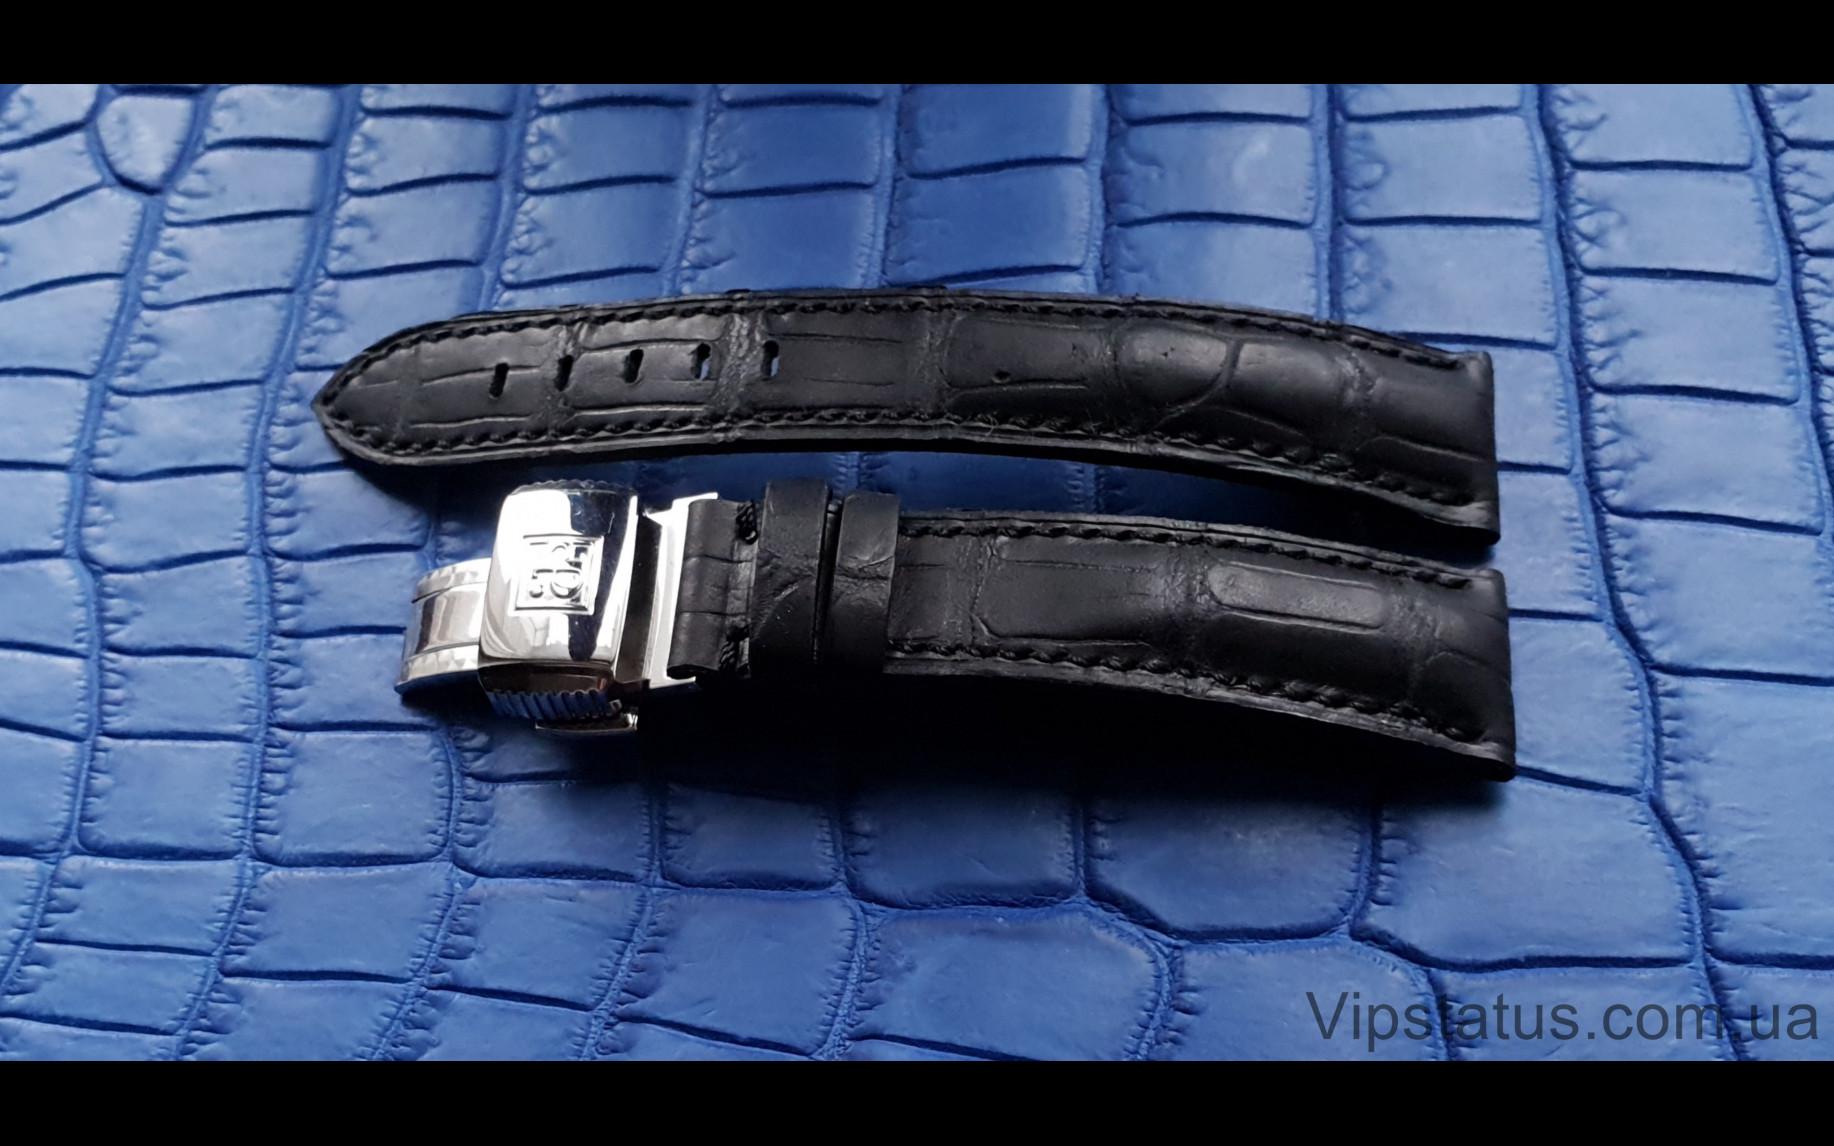 Elite Эксклюзивный ремешок для часов Perrelet кожа крокодила Exclusive Crocodile Strap for Perrelet watches image 3